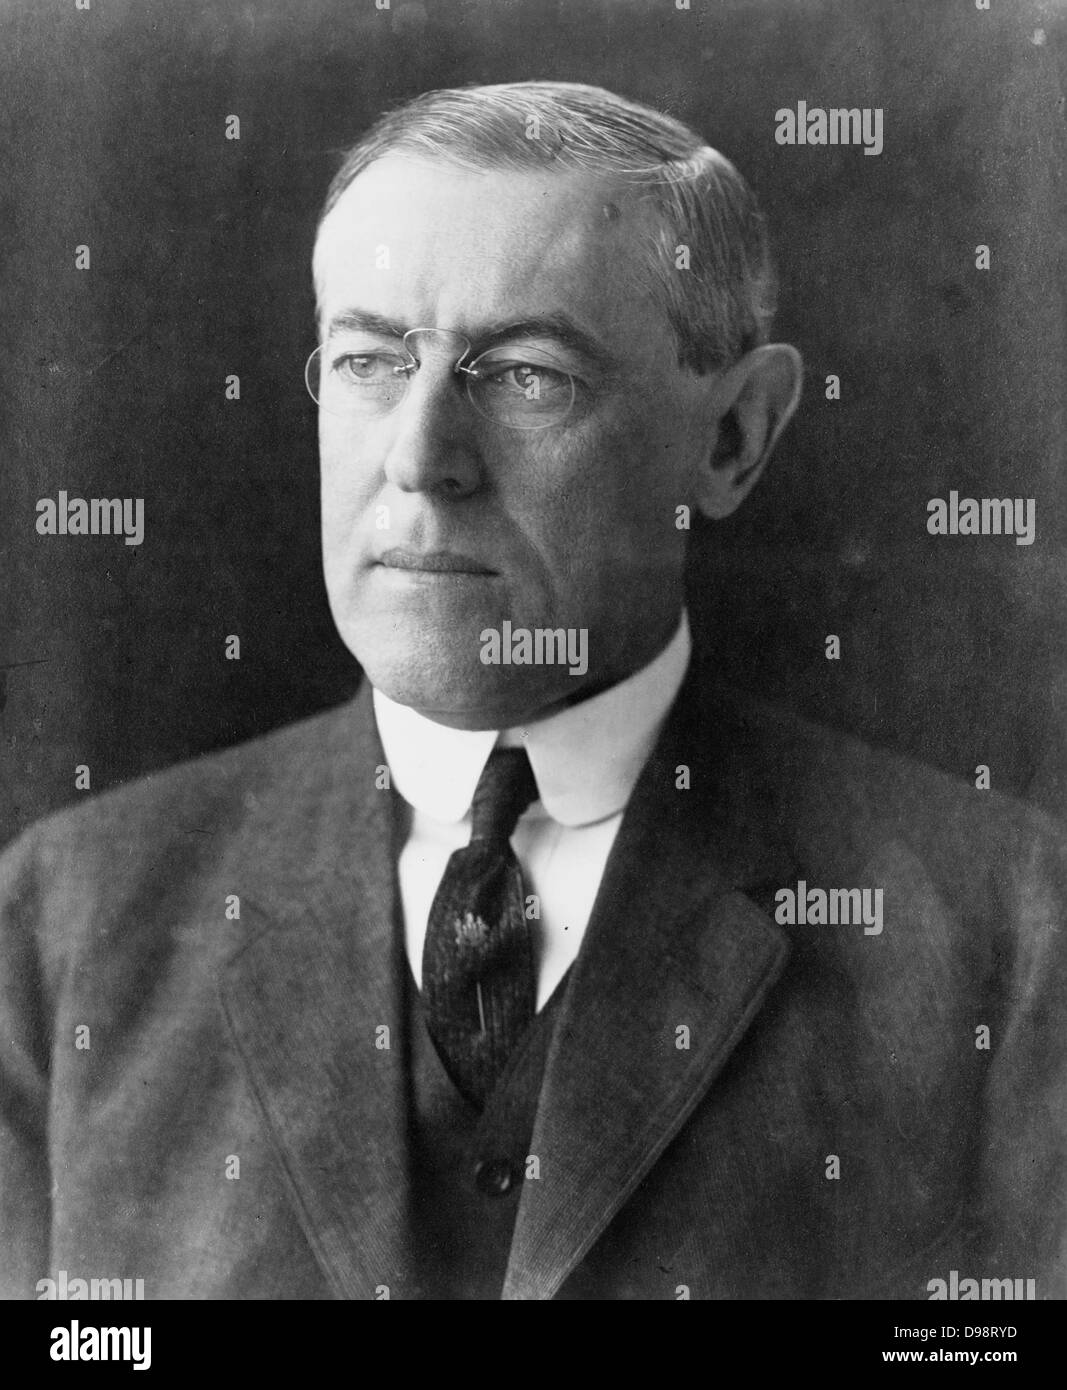 President Woodrow Wilson portrait 1912 - Stock Image